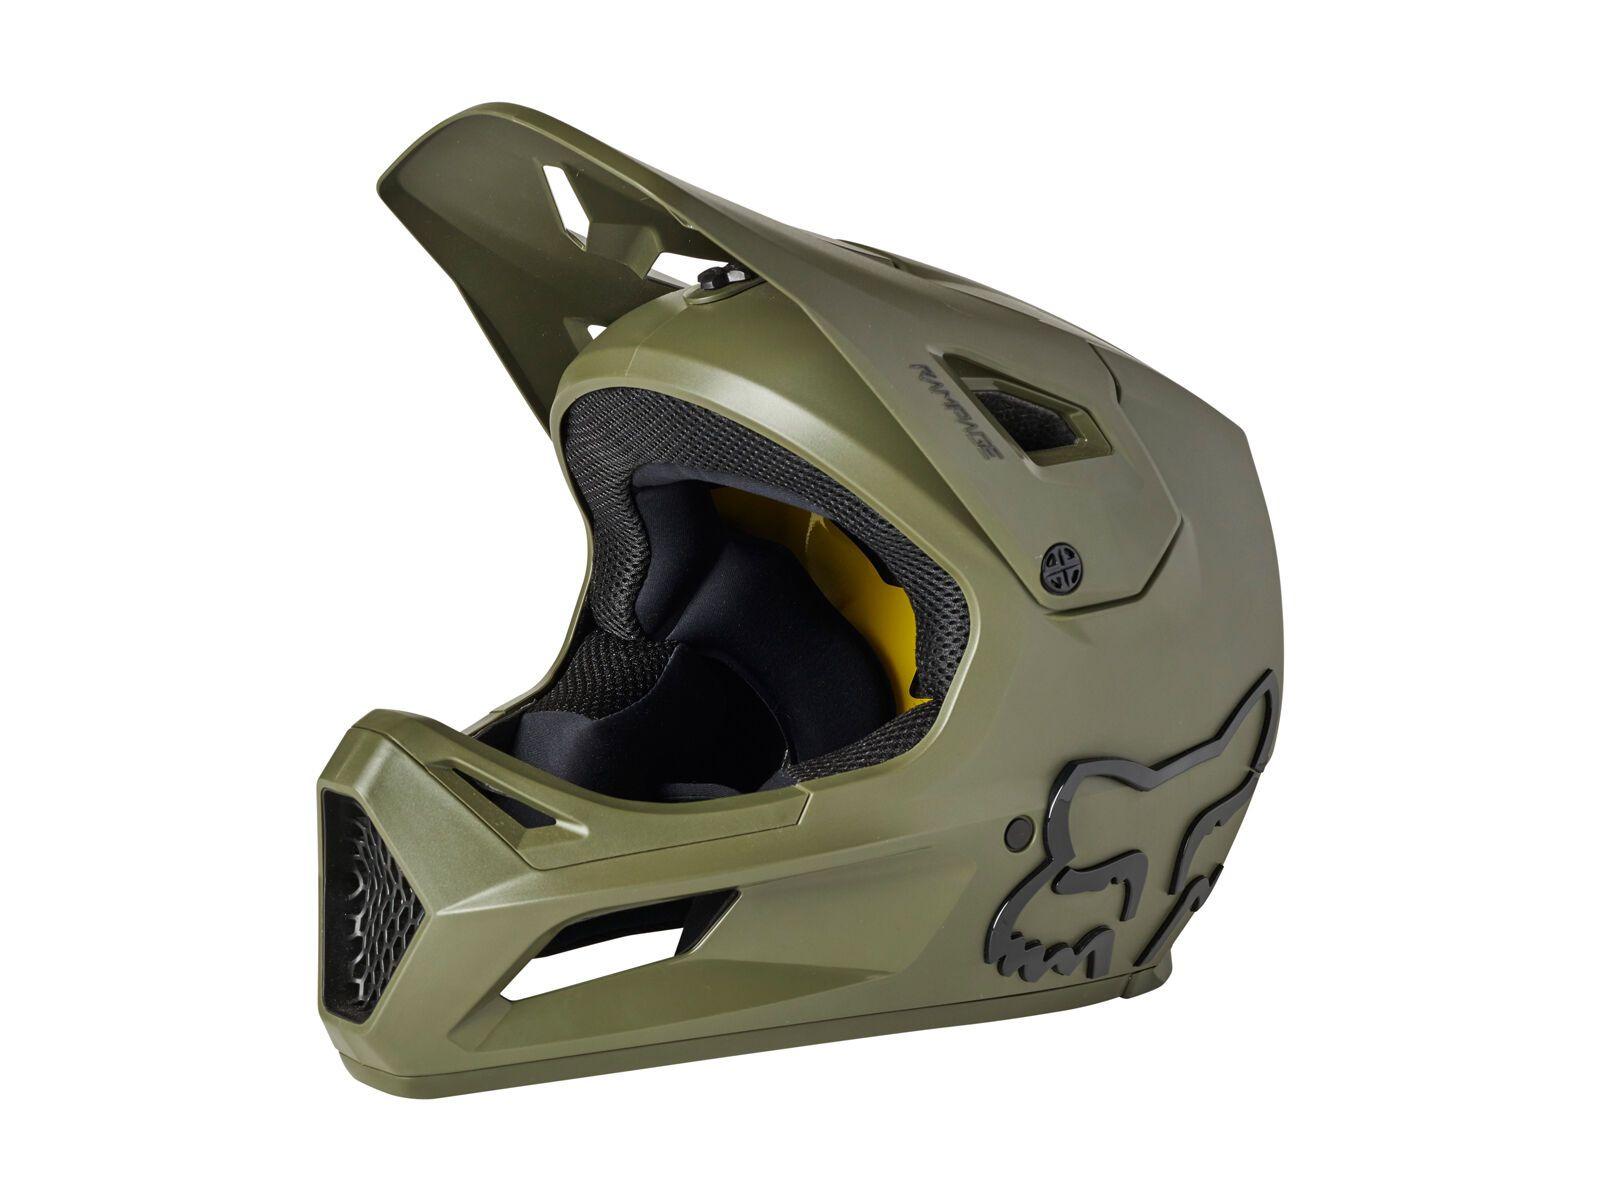 Fox Rampage Helmet olive green XL // 60-62 cm 27509-099-XL